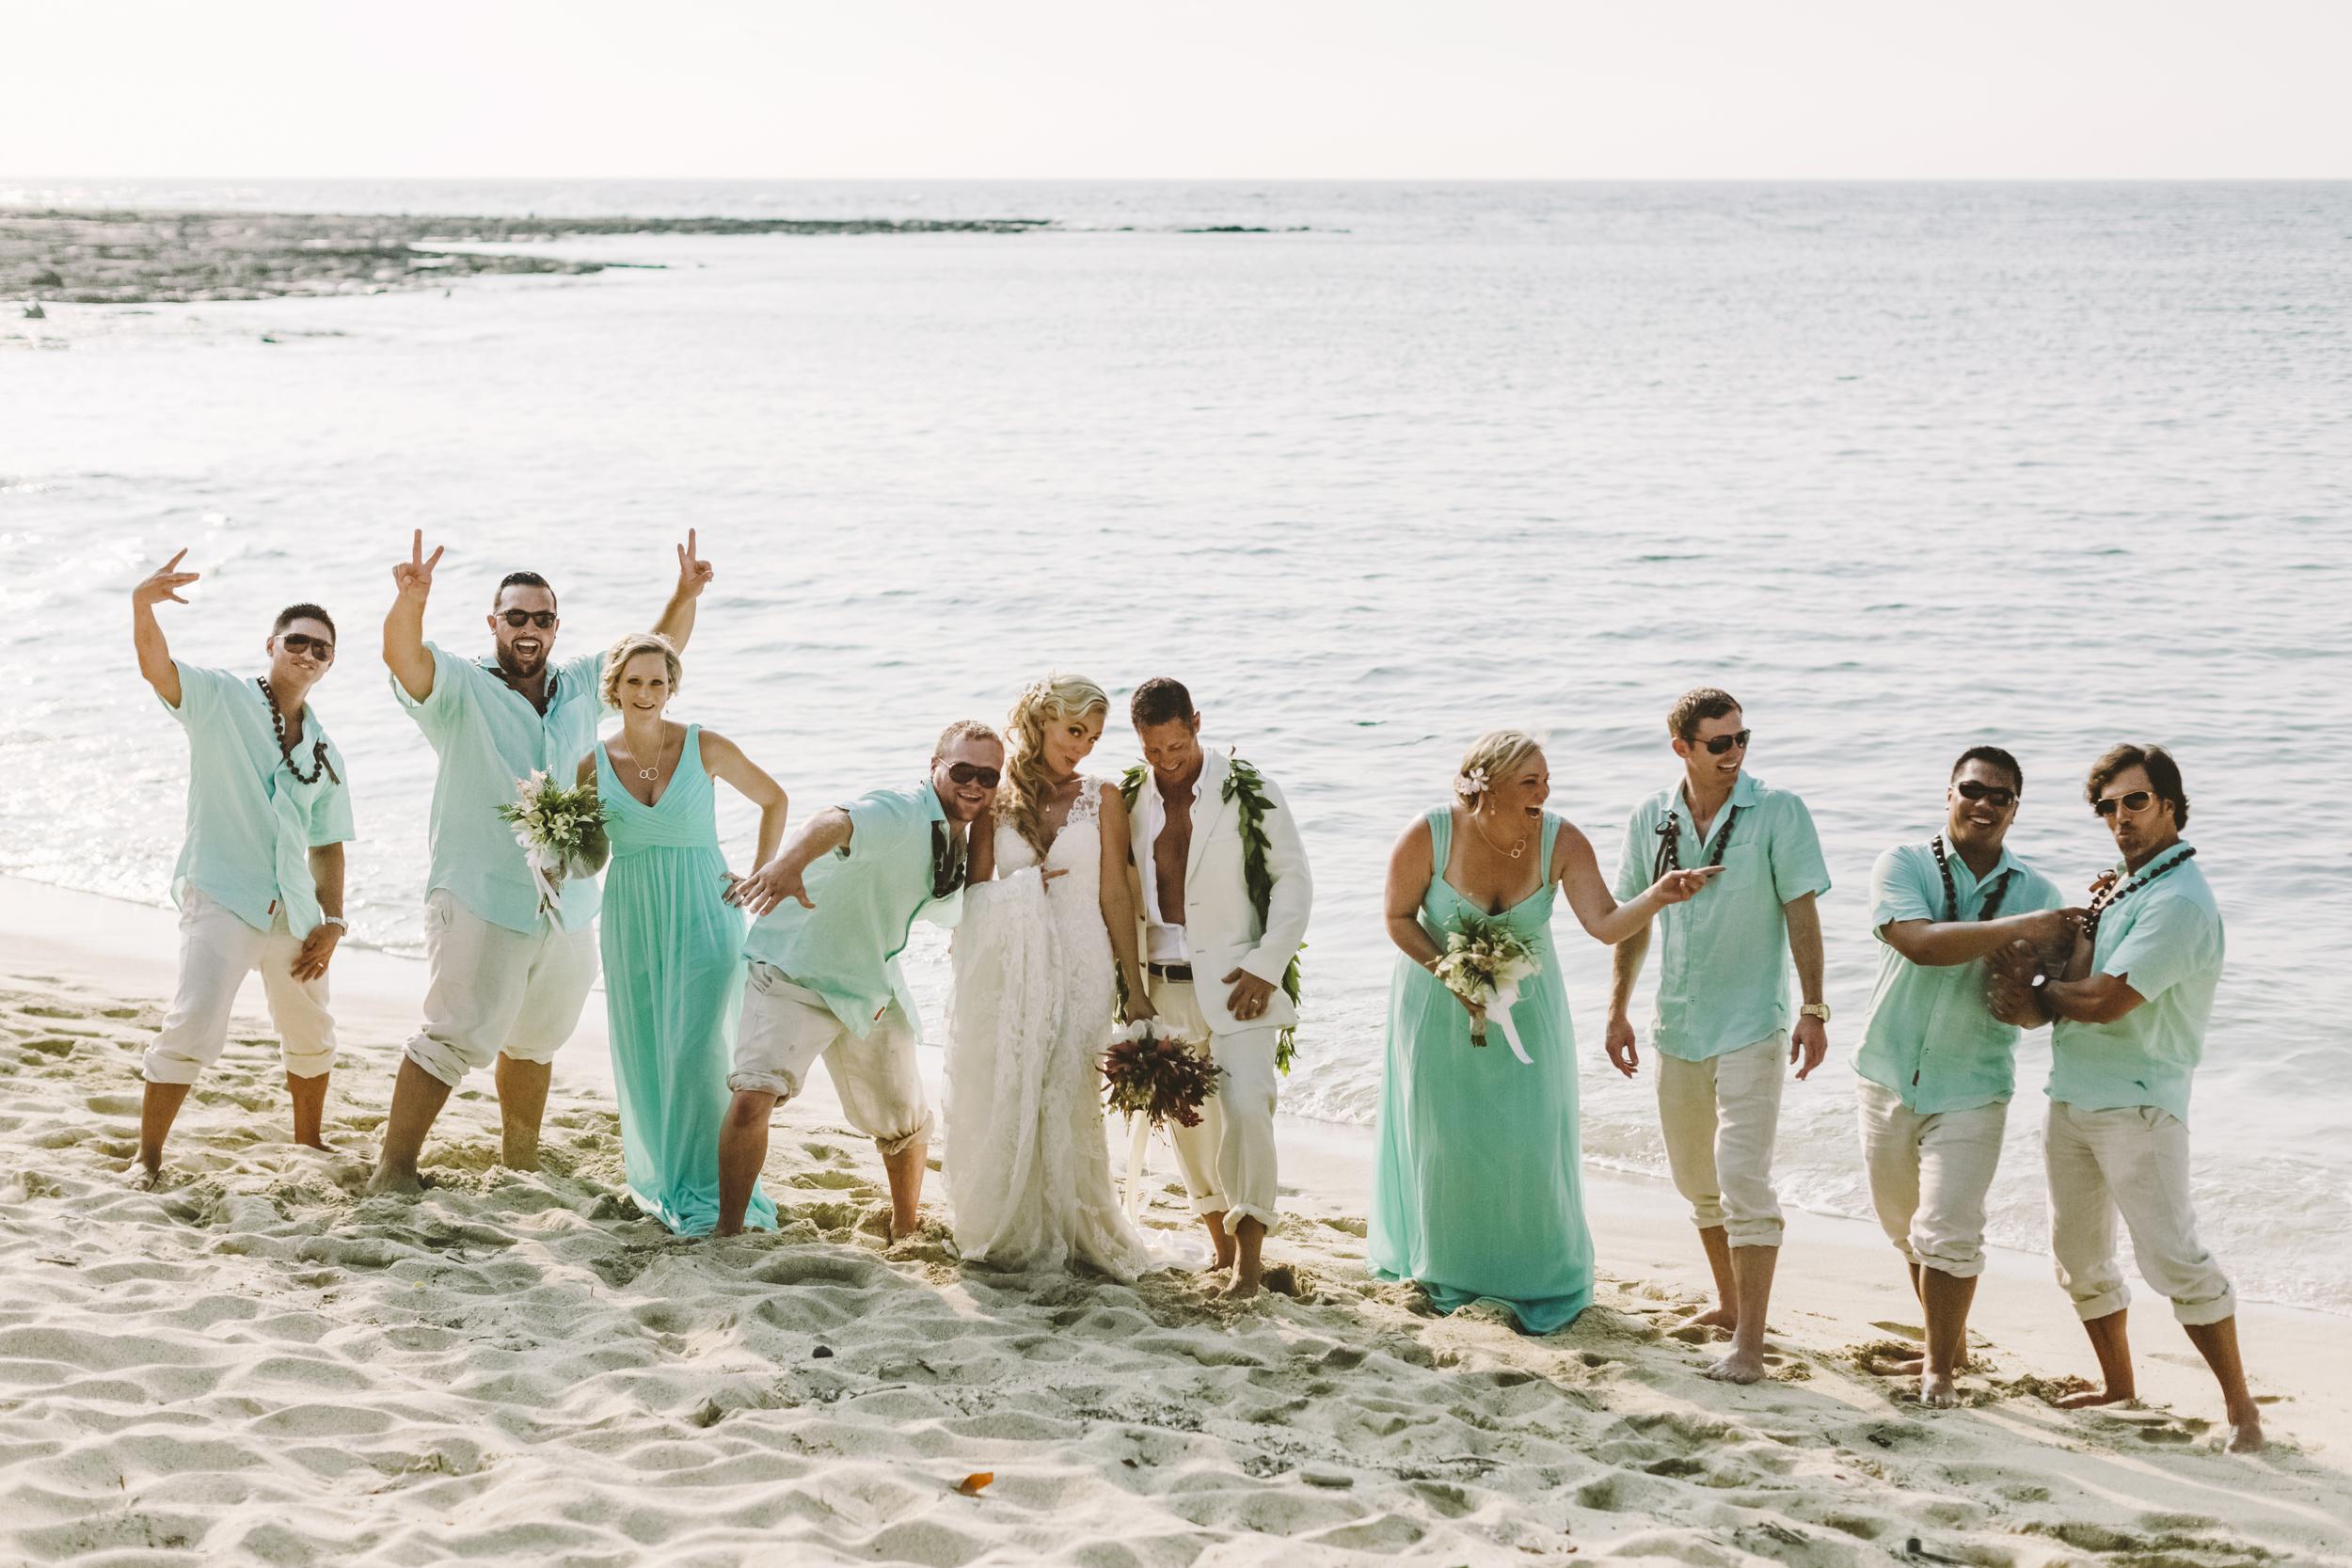 angie-diaz-photography-hawaii-wedding-photographer-kelli-jay-83.jpg